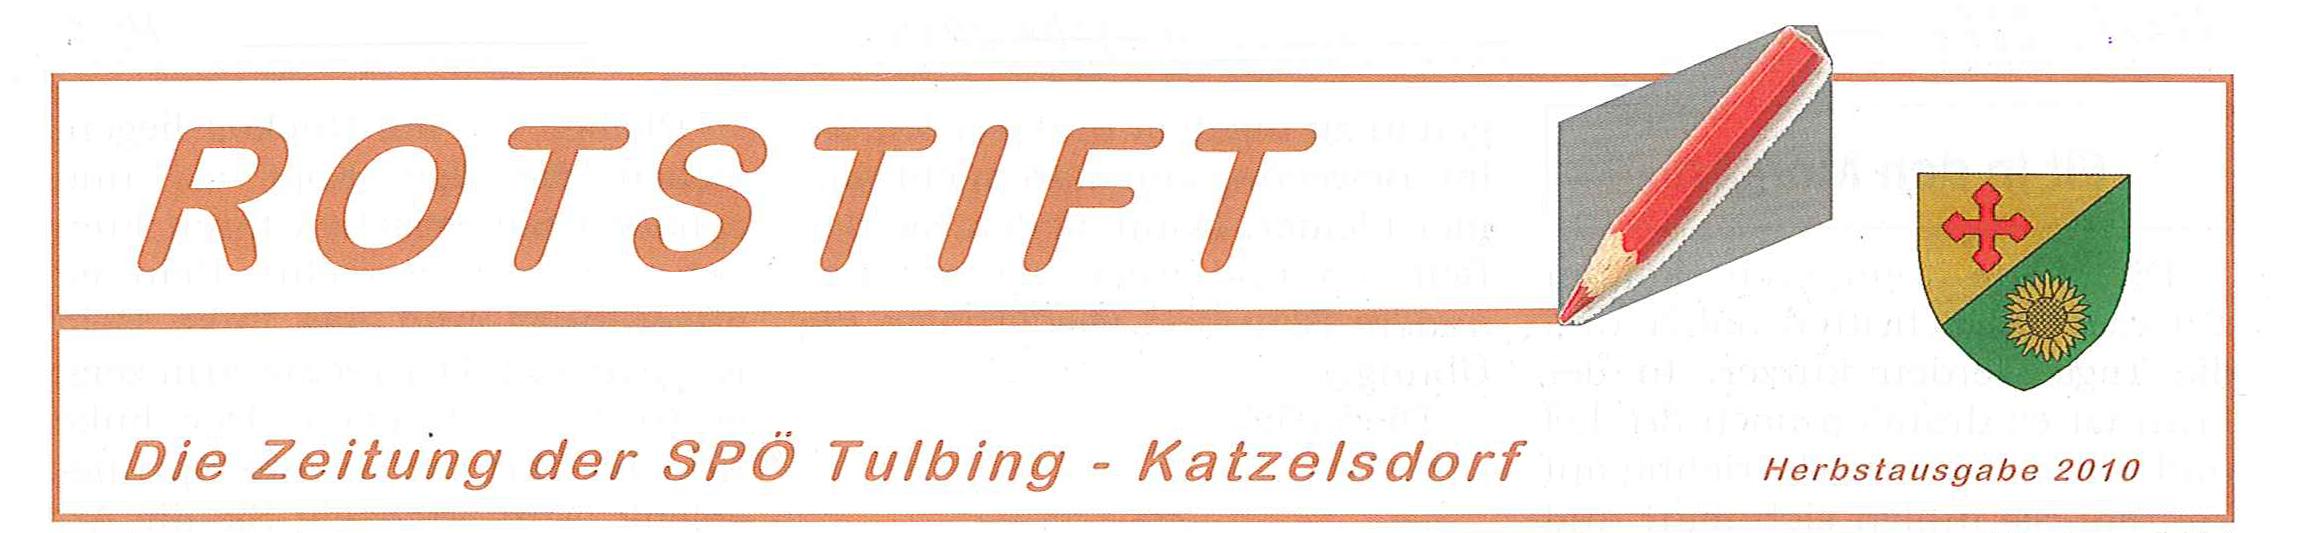 Rotstift_logo